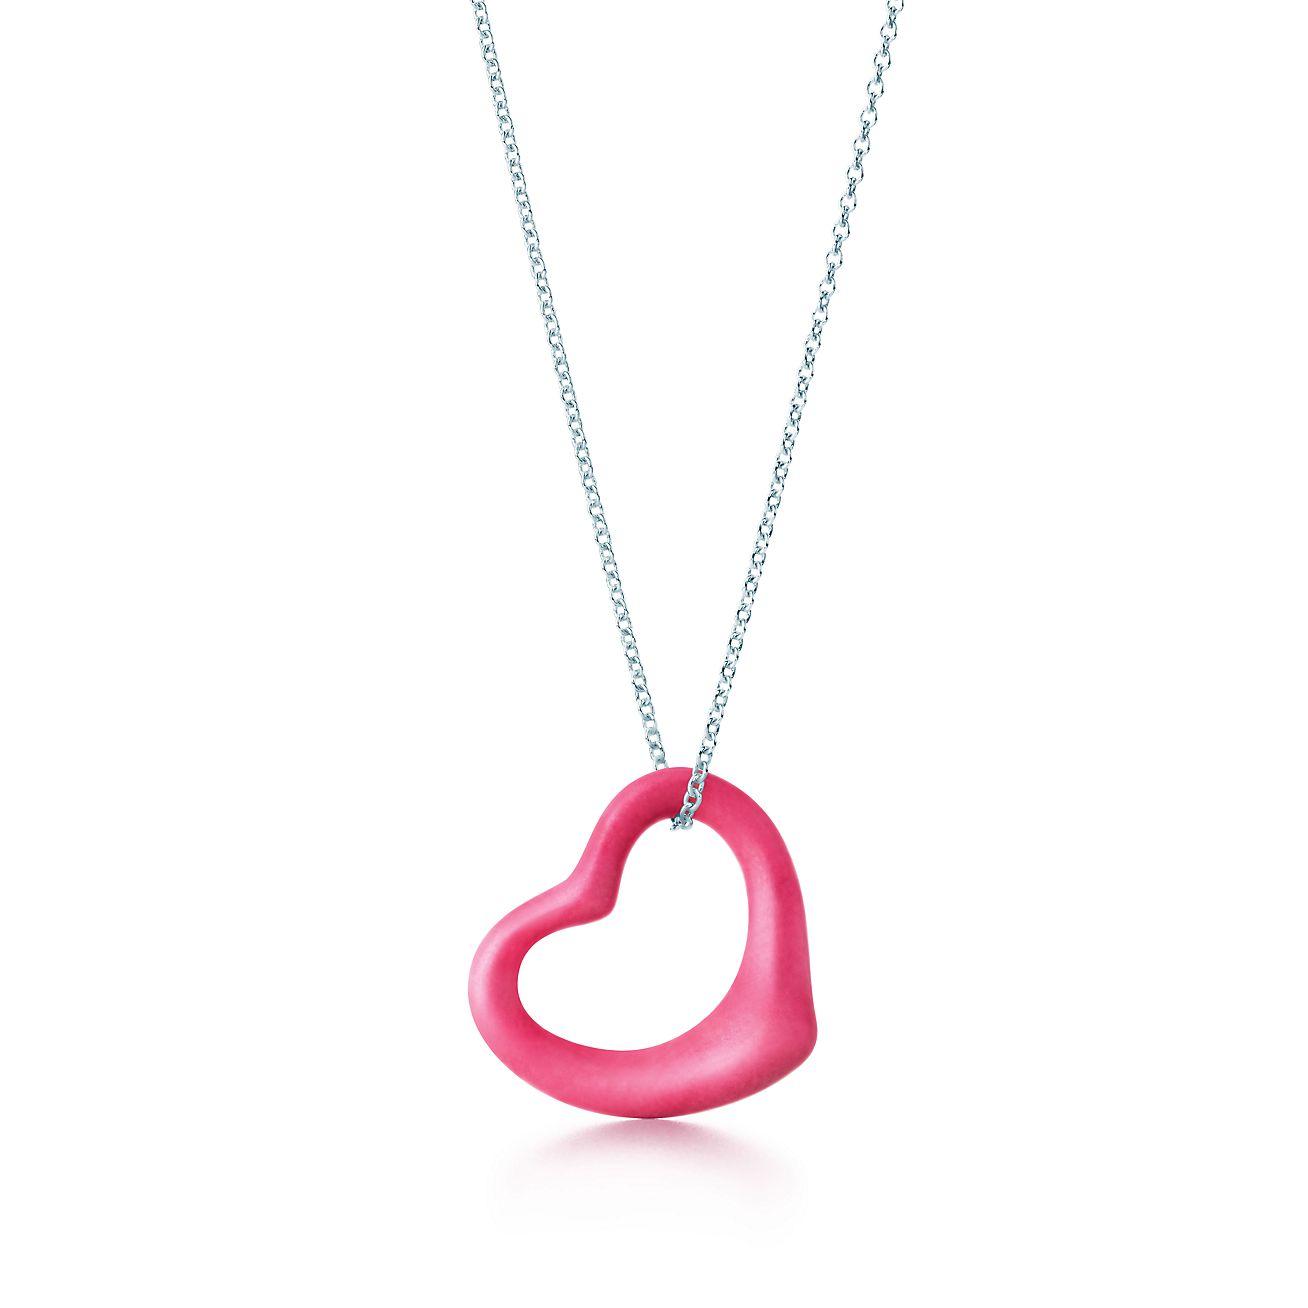 FN-5590 Stone Heart Pendant